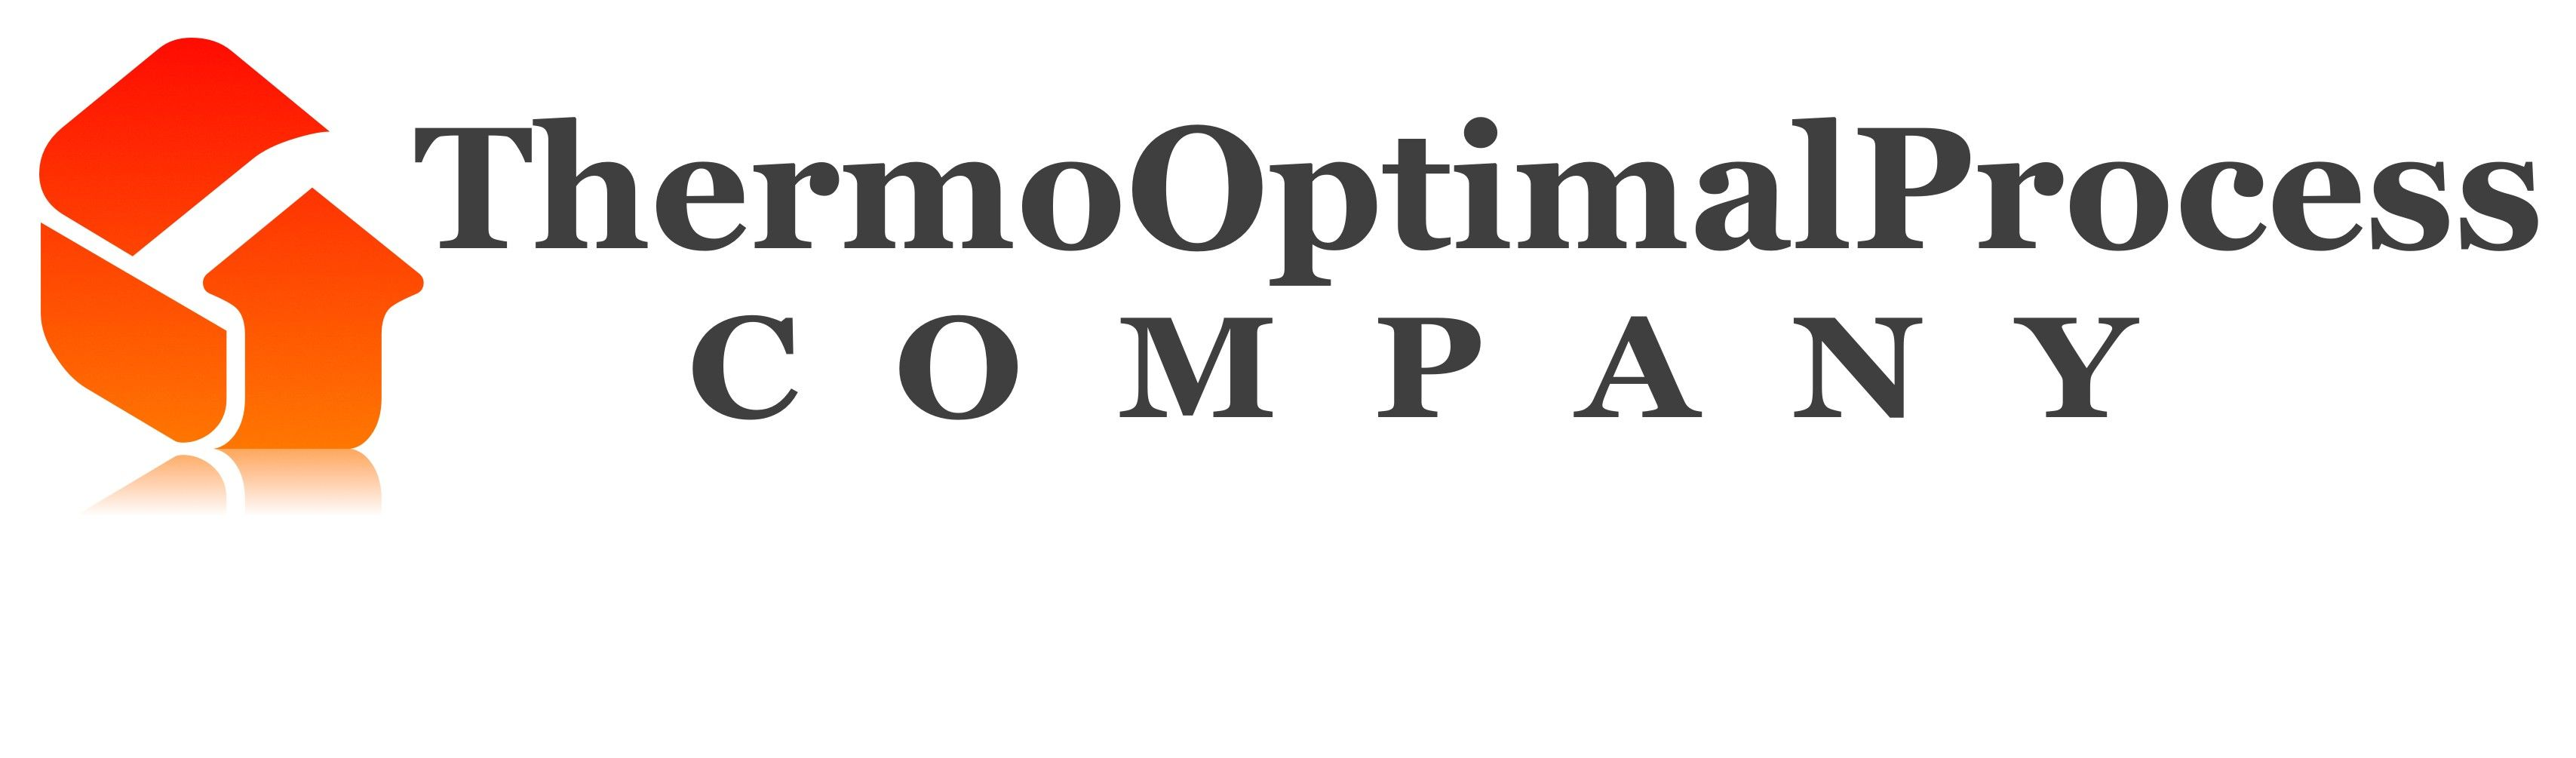 Thermo Optimal Process Company doo